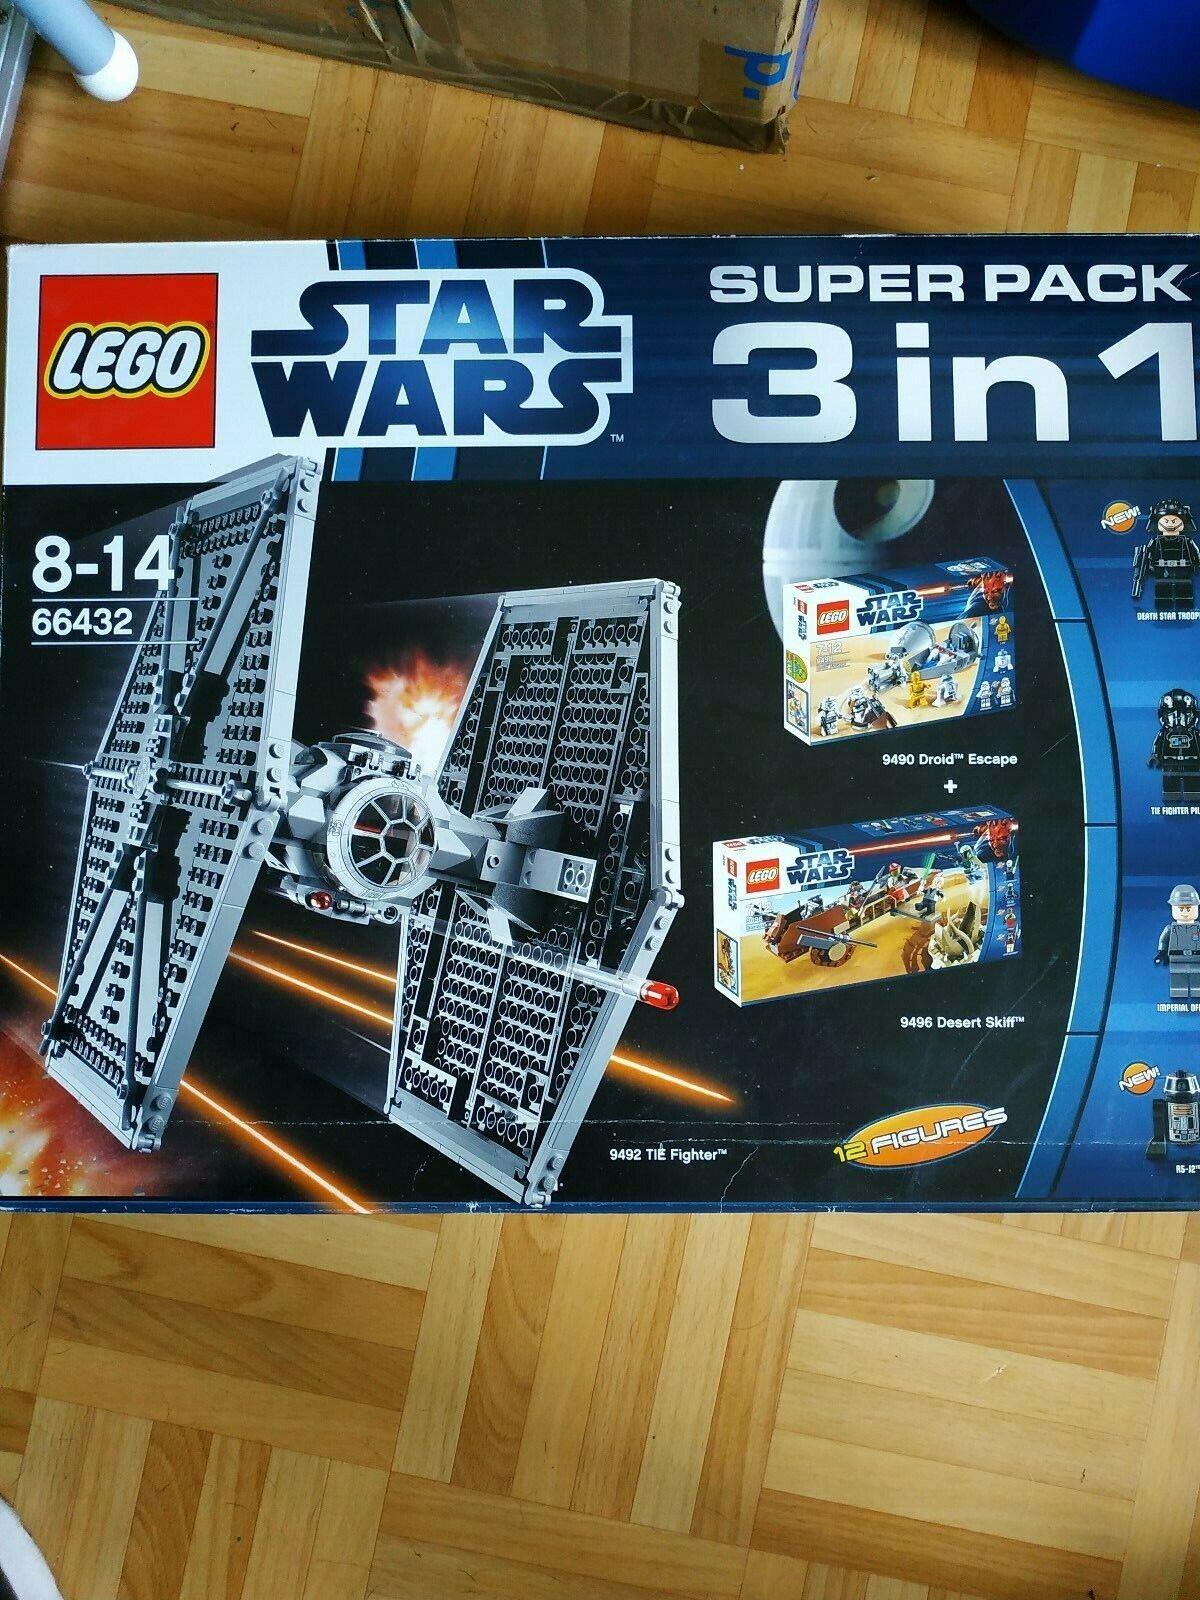 Lego Star Wars 3 in 1 Set 66432  ( 9492  9496  9490 )